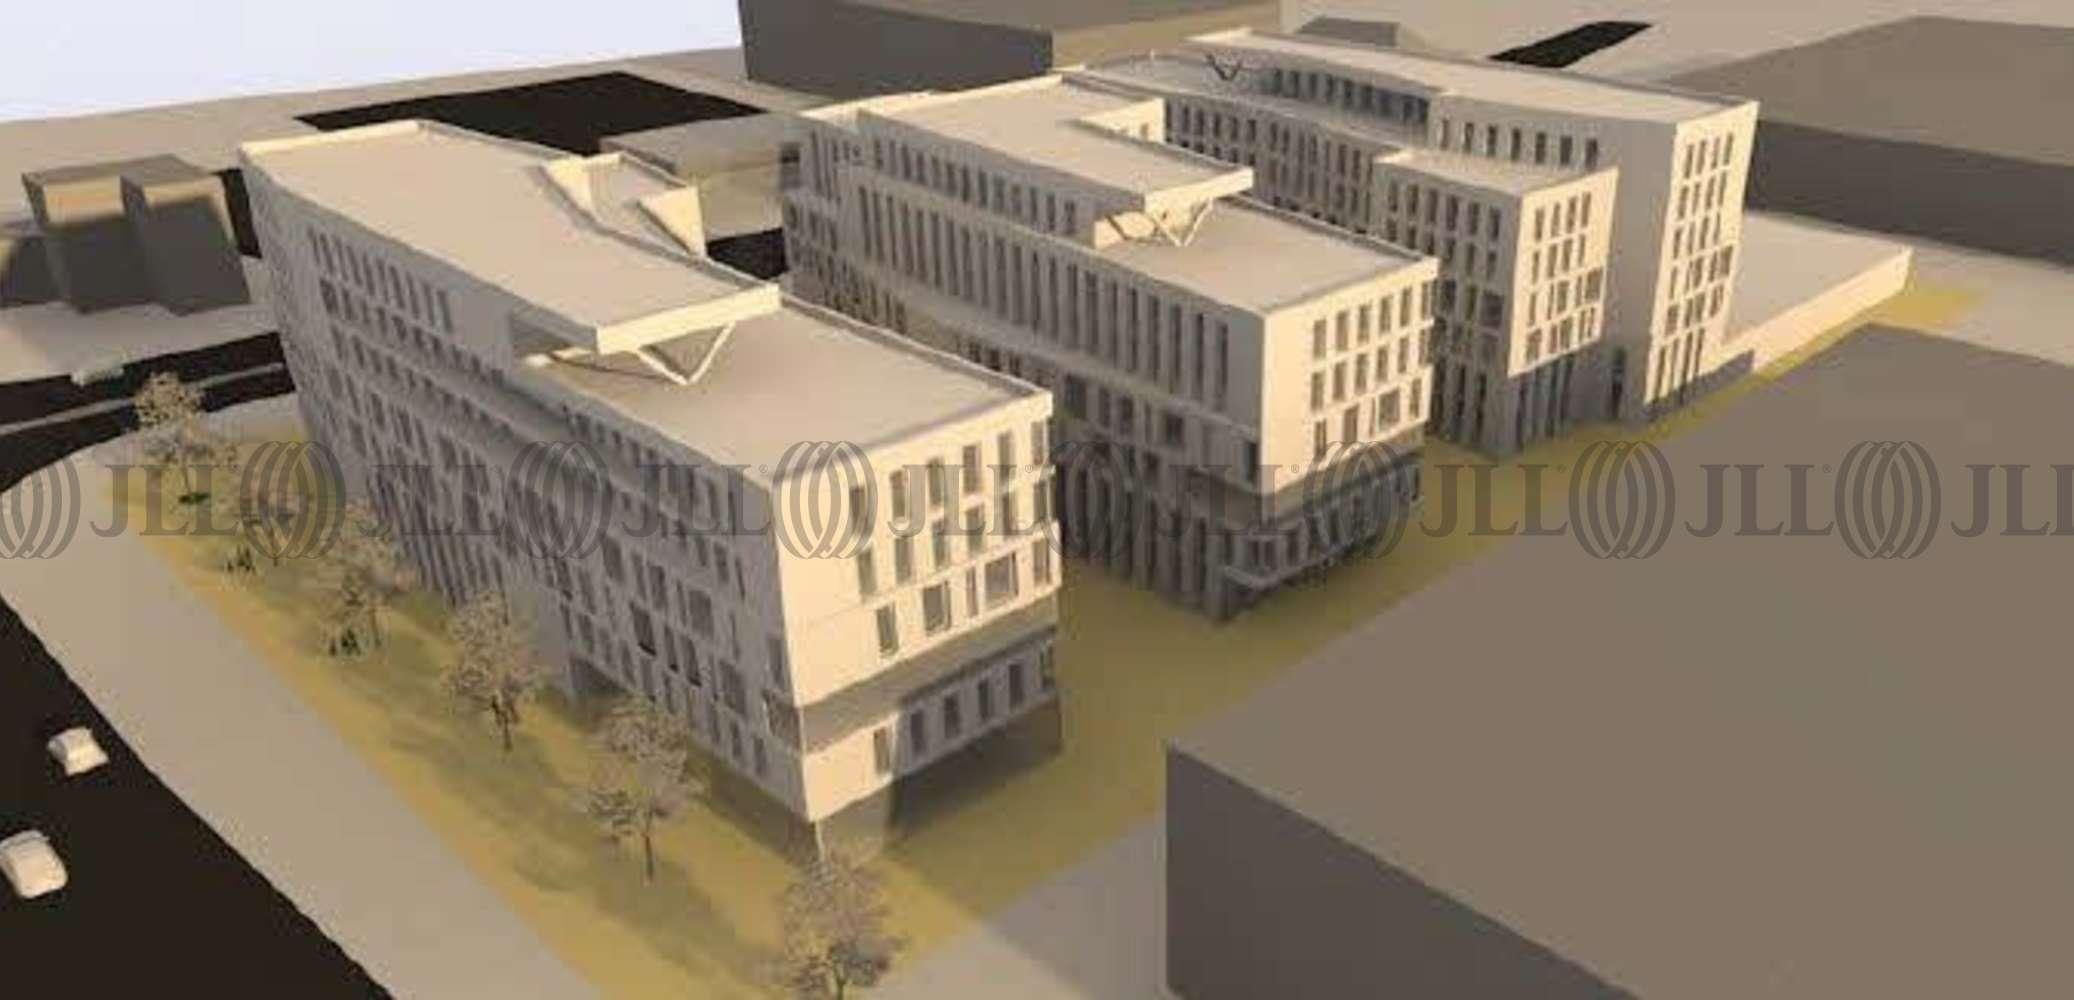 Büros Offenbach am main, 63069 - Büro - Offenbach am Main - F2603 - 10021710